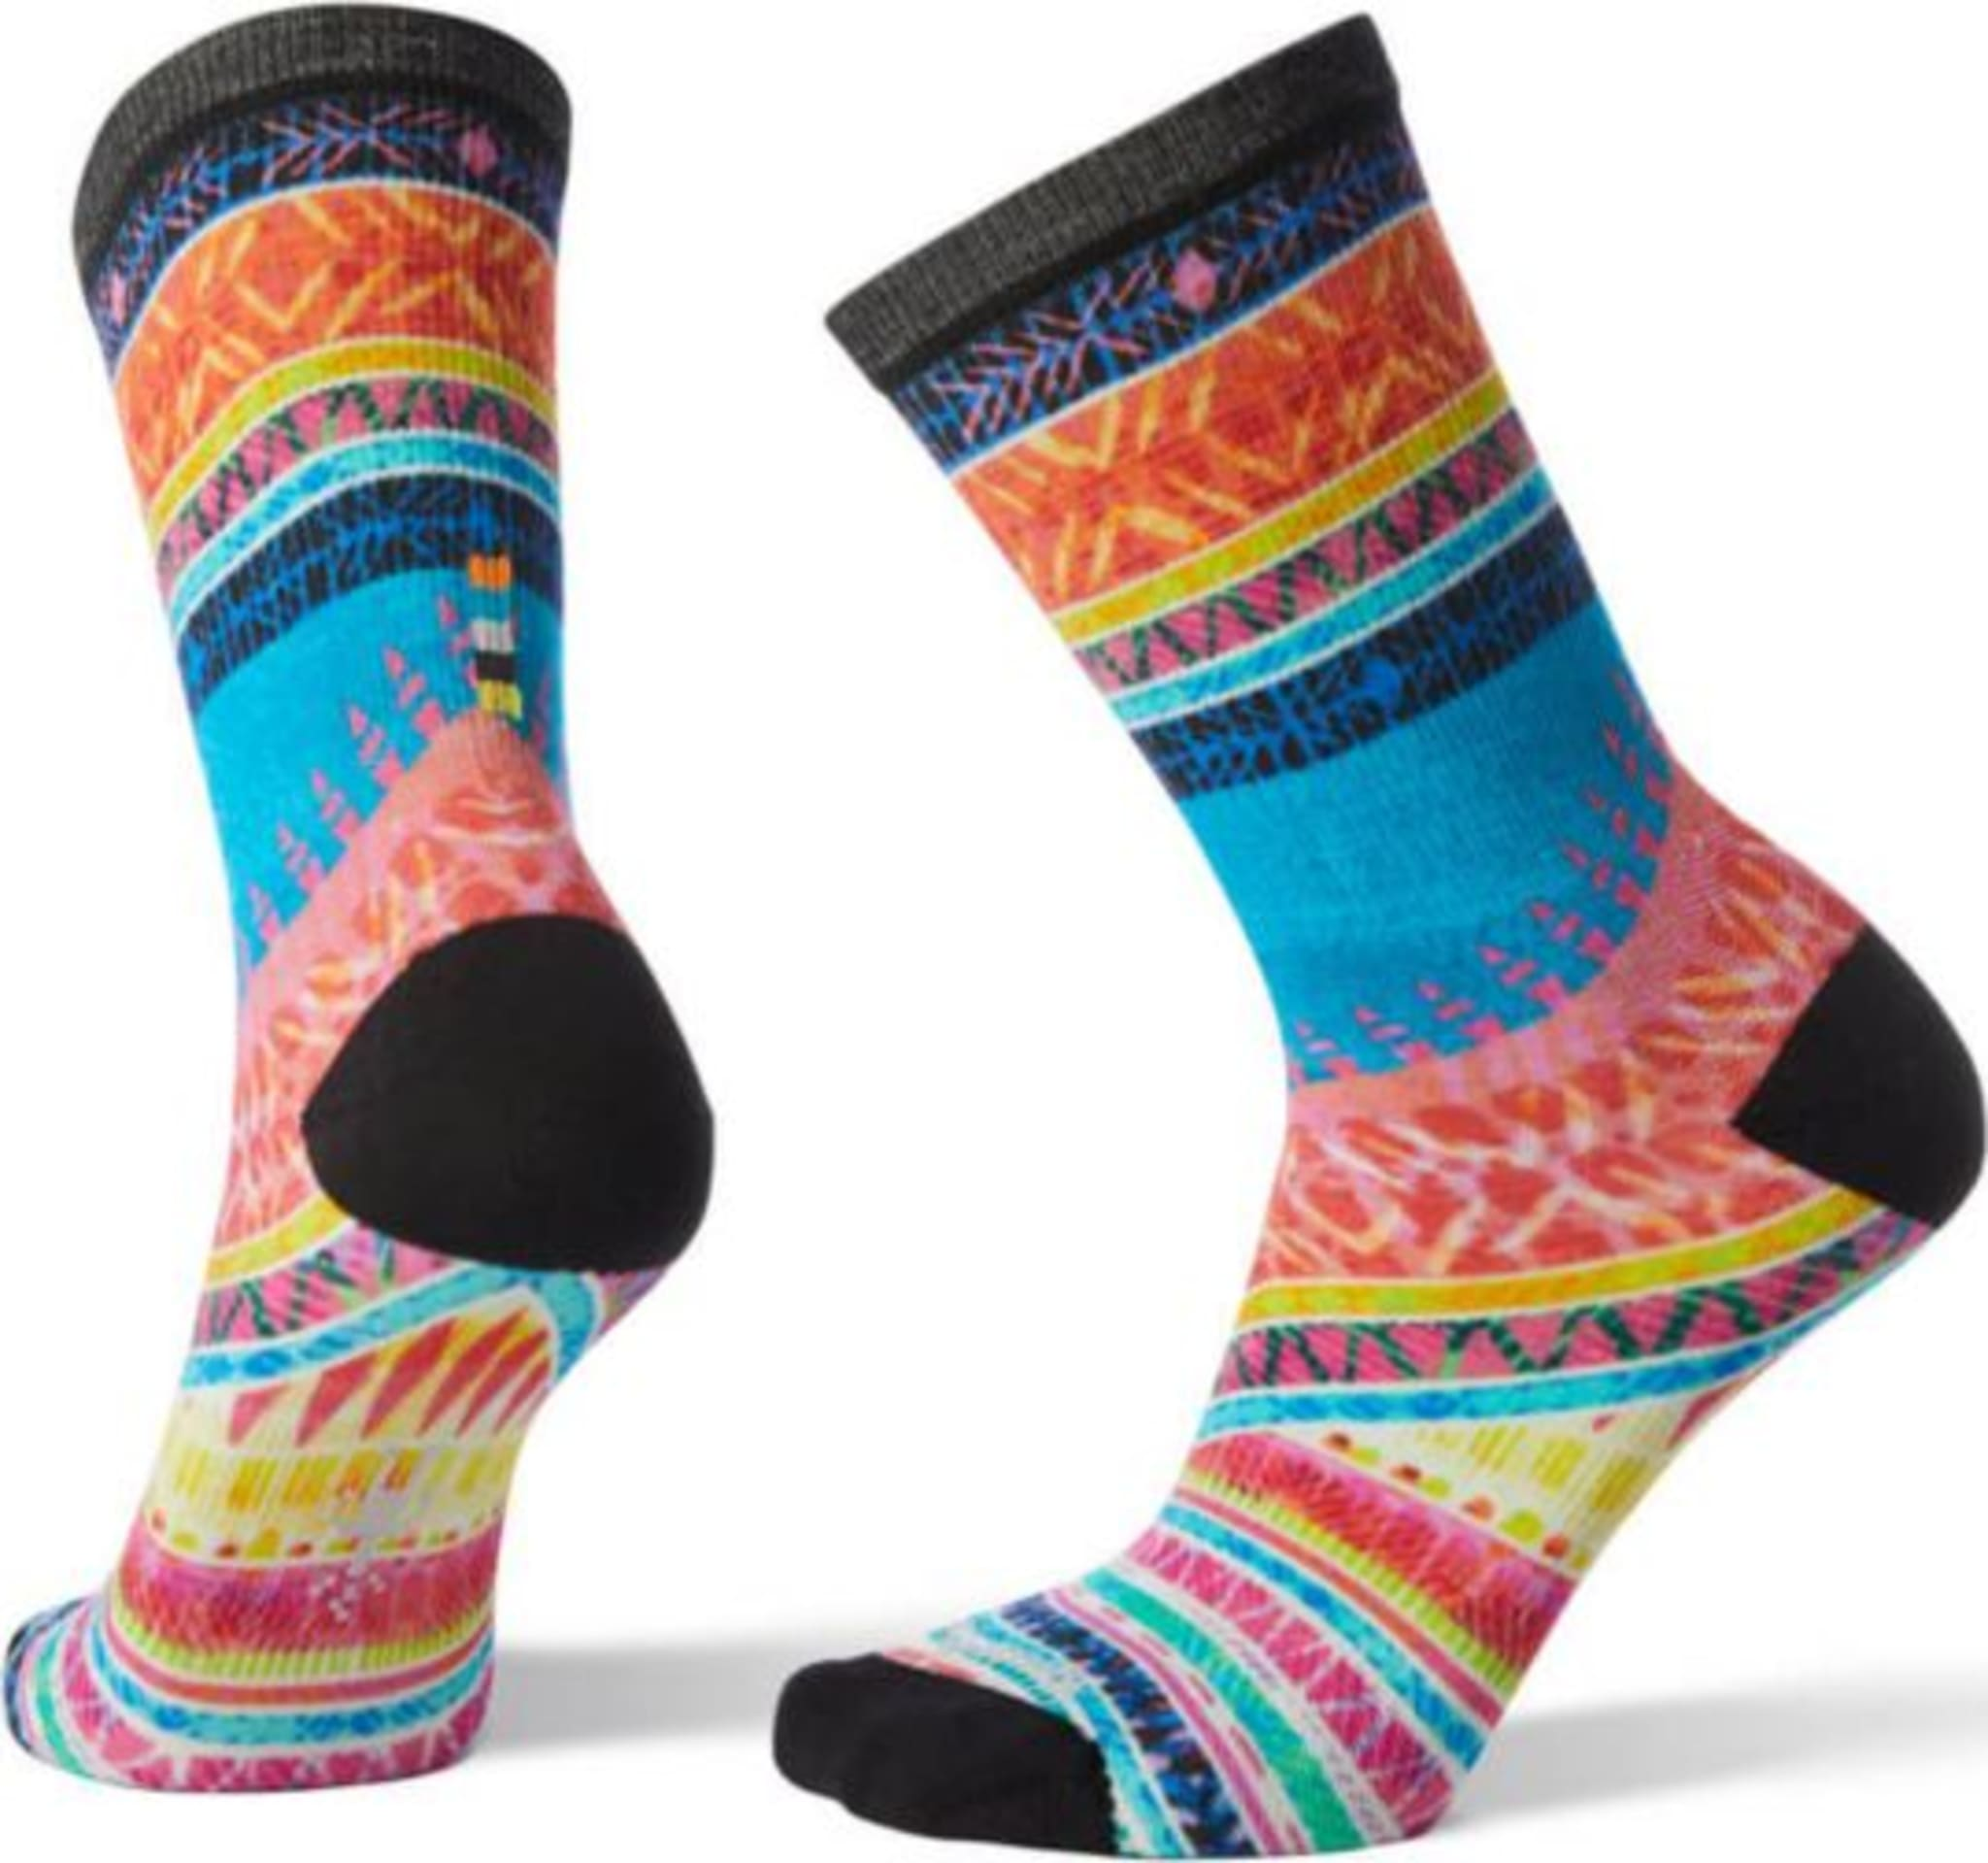 Klassiske smartwool sokker i eksklusivt design